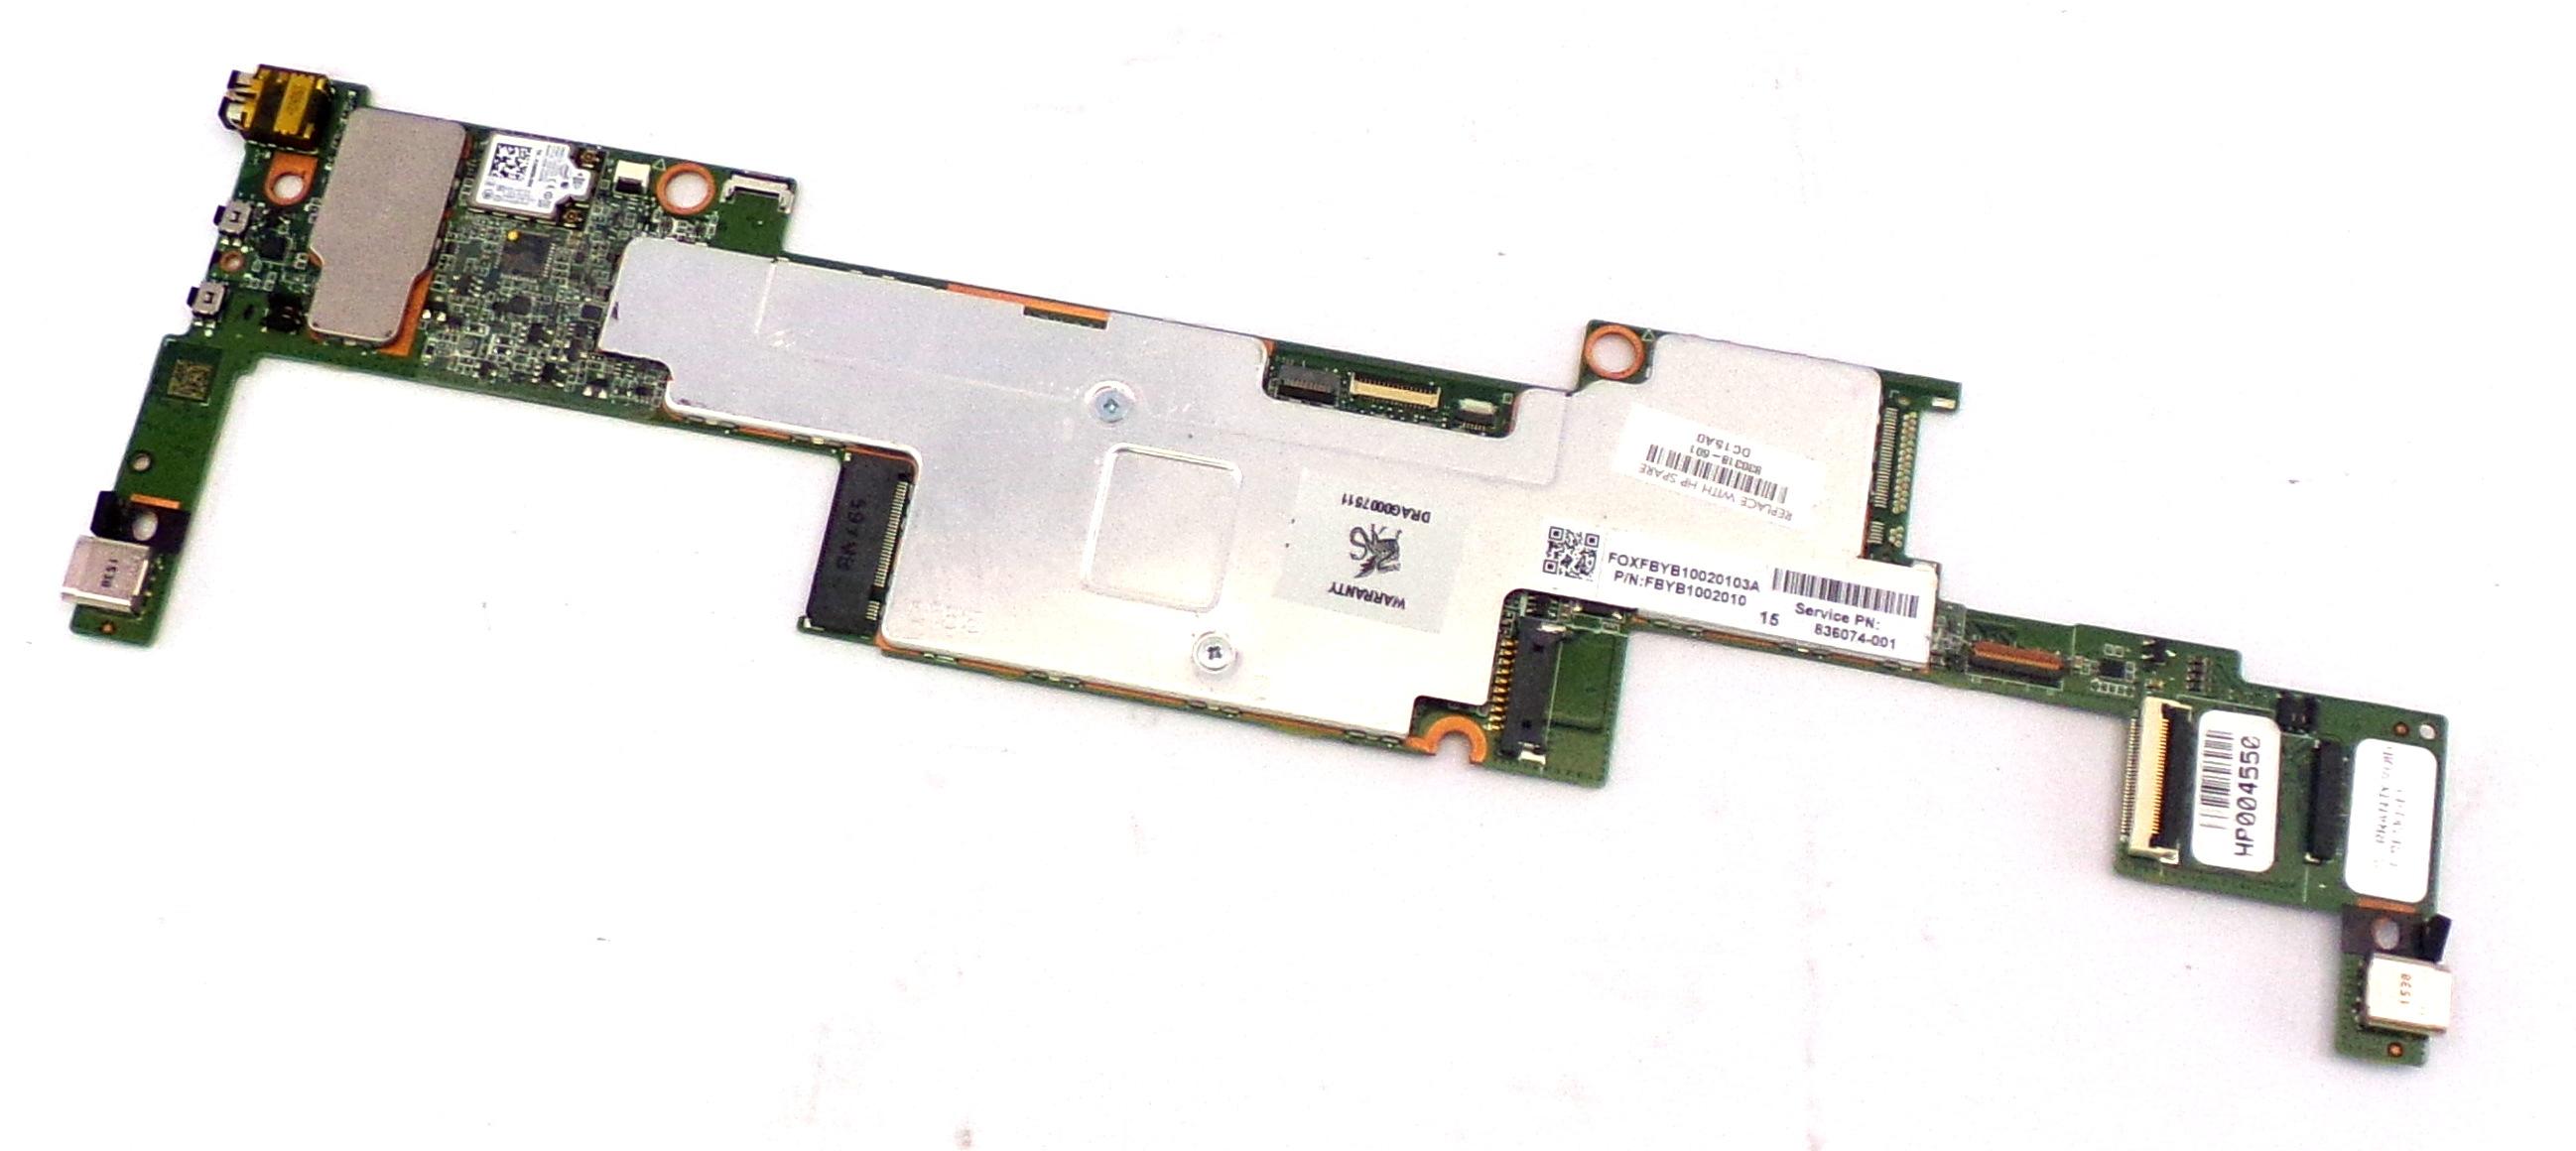 830318-601 HP Spectre X2 12 Motherboard YB1 - DA0YB1MBAI0